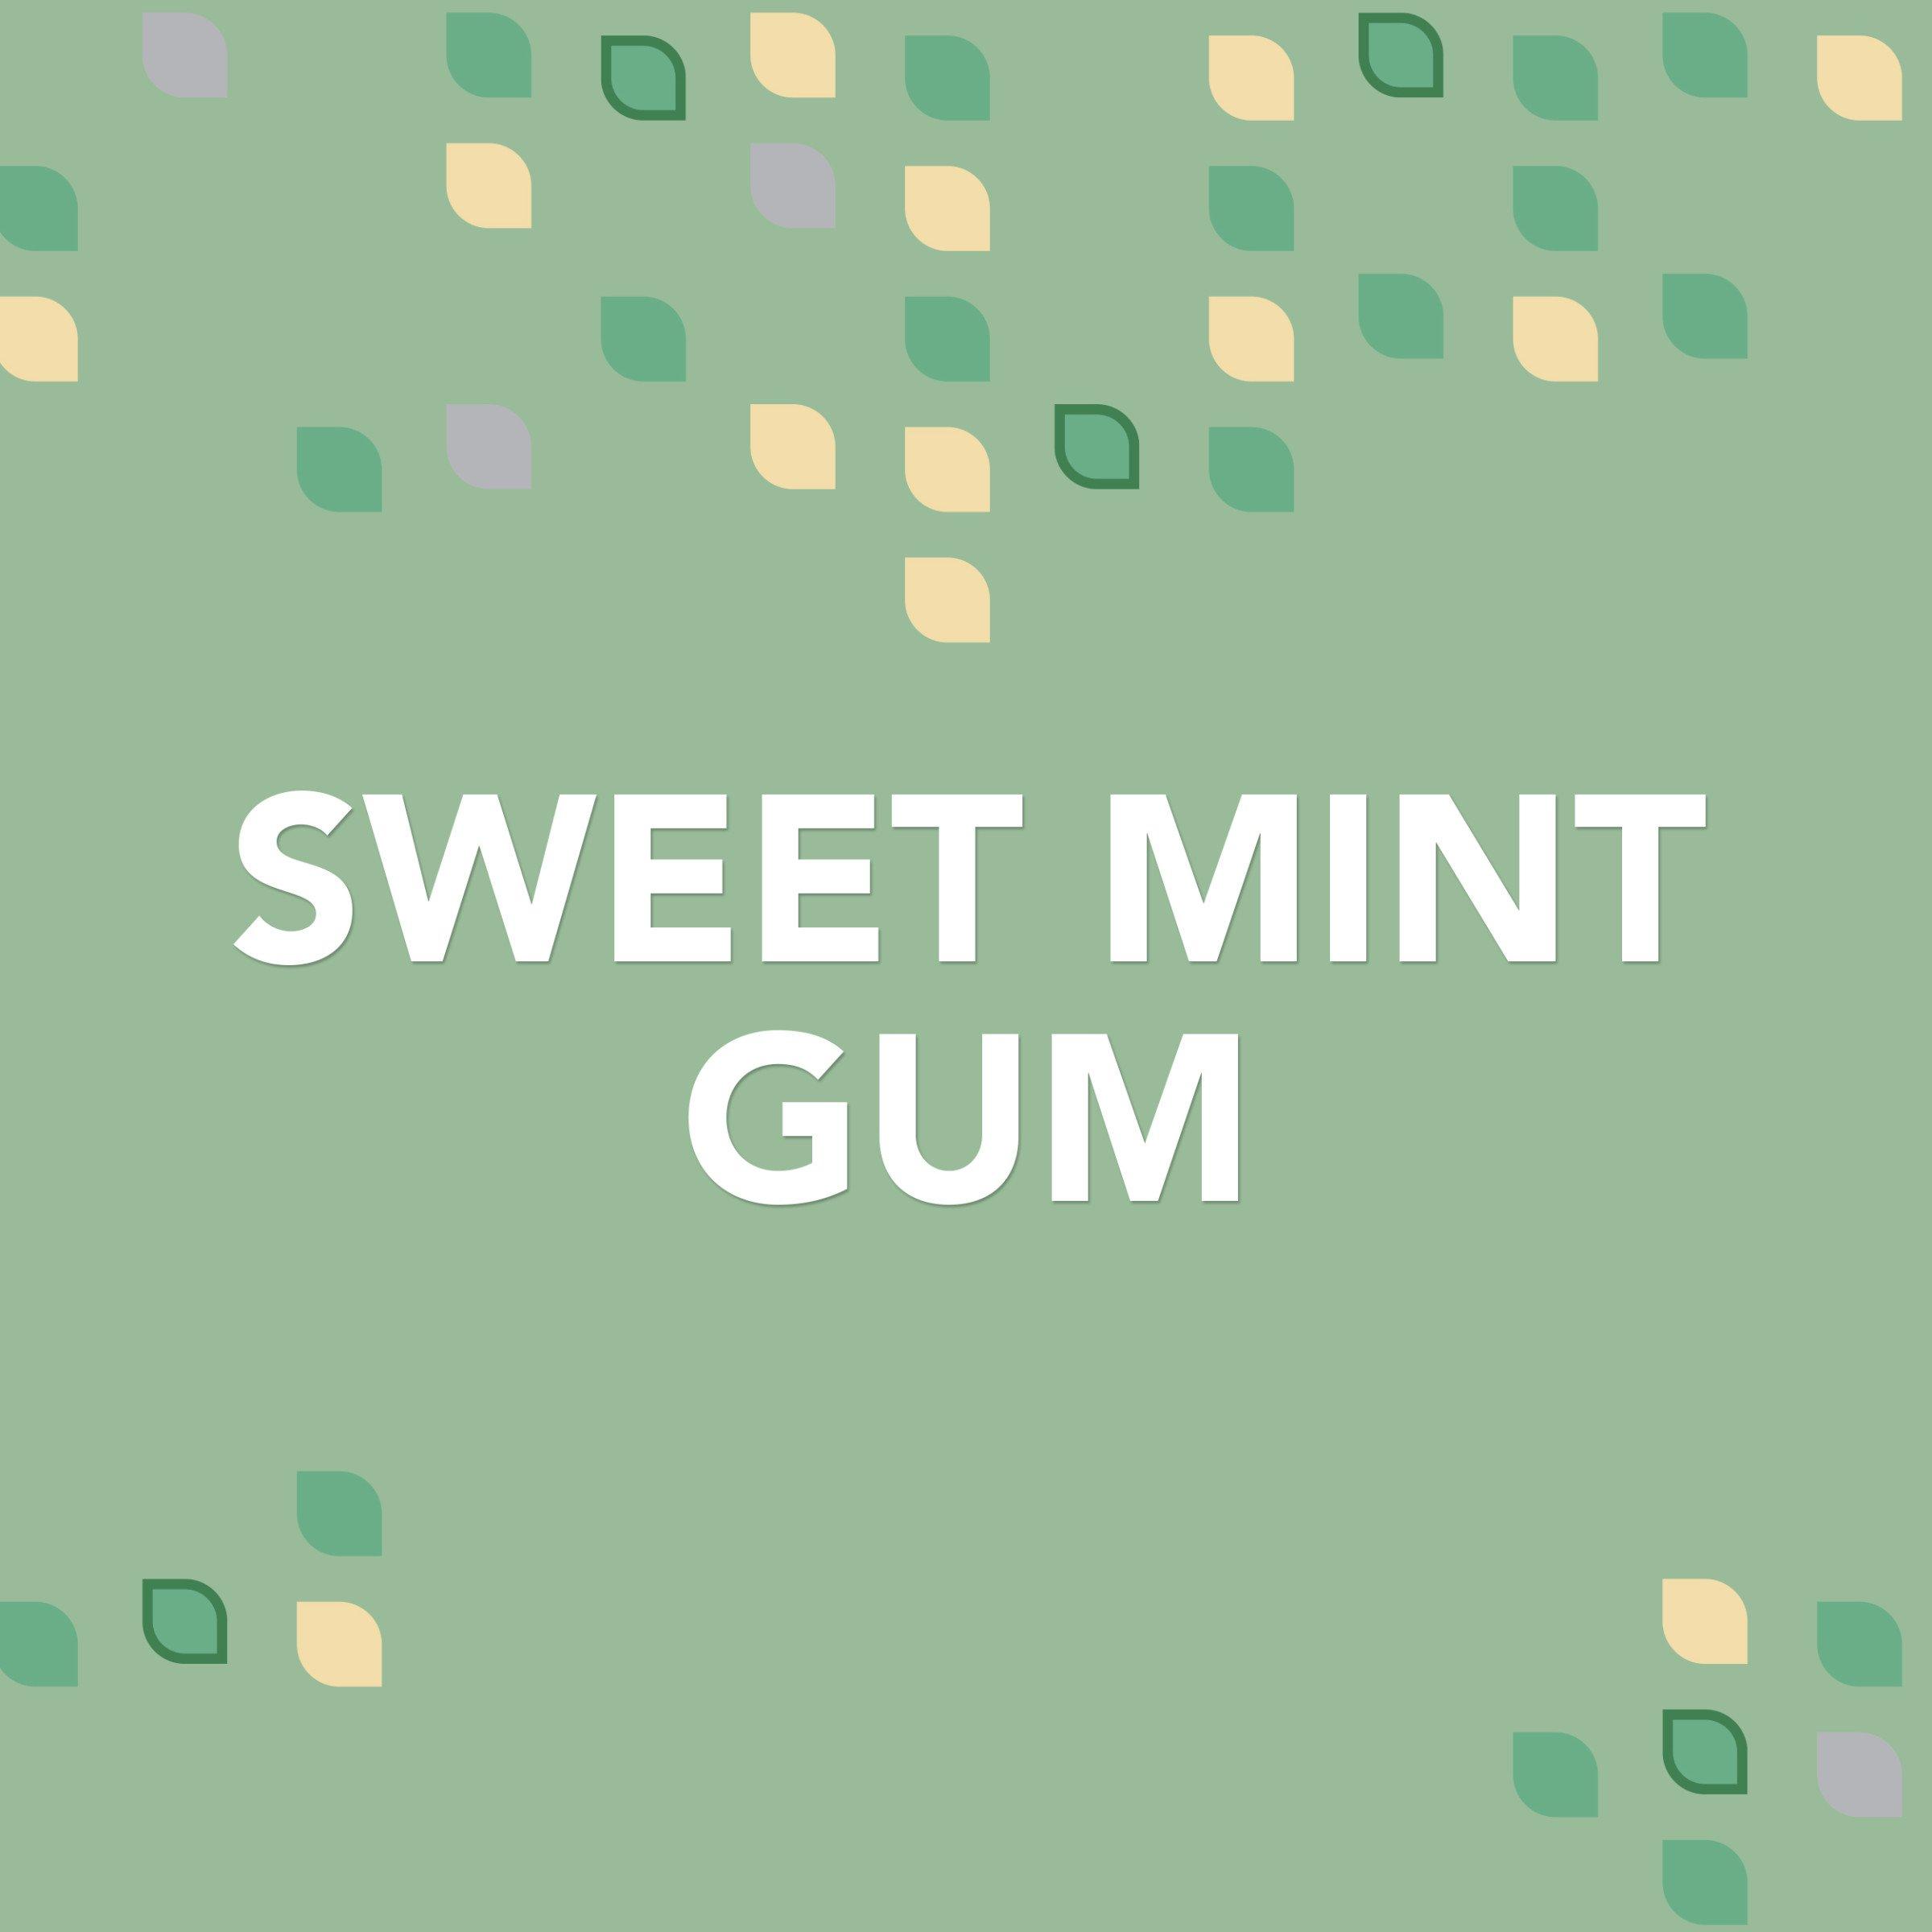 Orbit Sweet Mint Sugarfree Gum, 8 Count (Pack of 6) by Orbit Gum (Image #4)